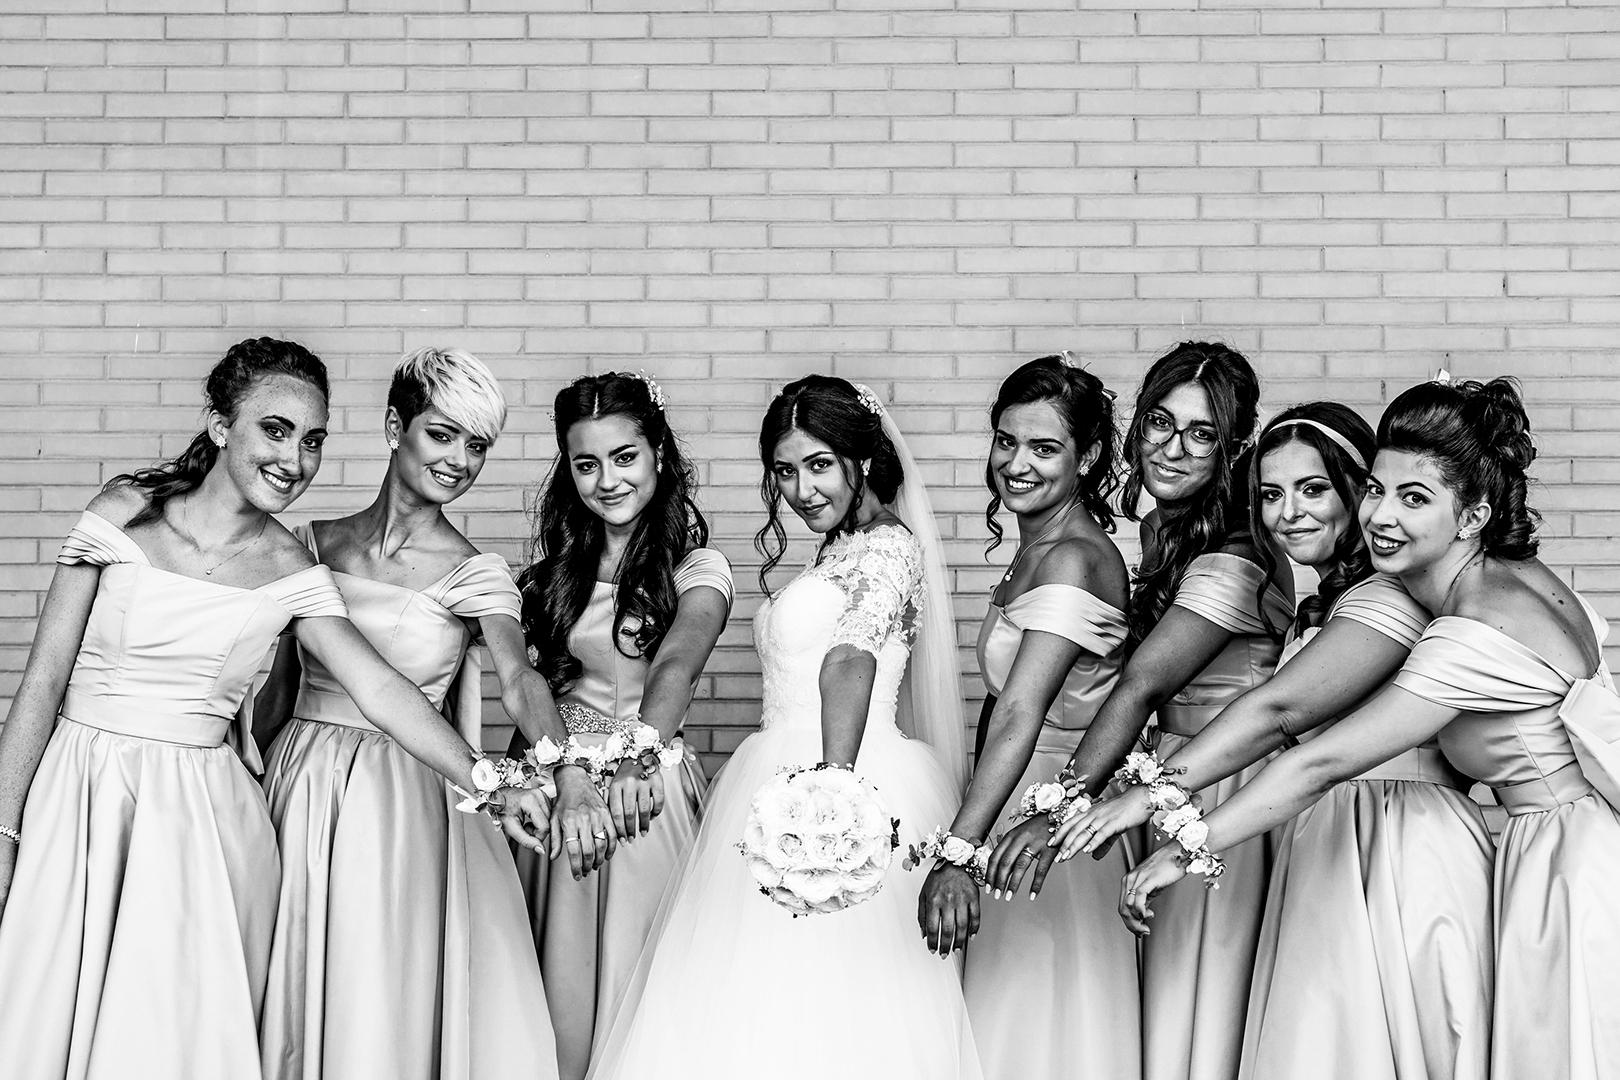 24 gianni-lepore-sposa-bride-foto-famiglia-damigelle-testimoni-ritratto-lucera-wedding